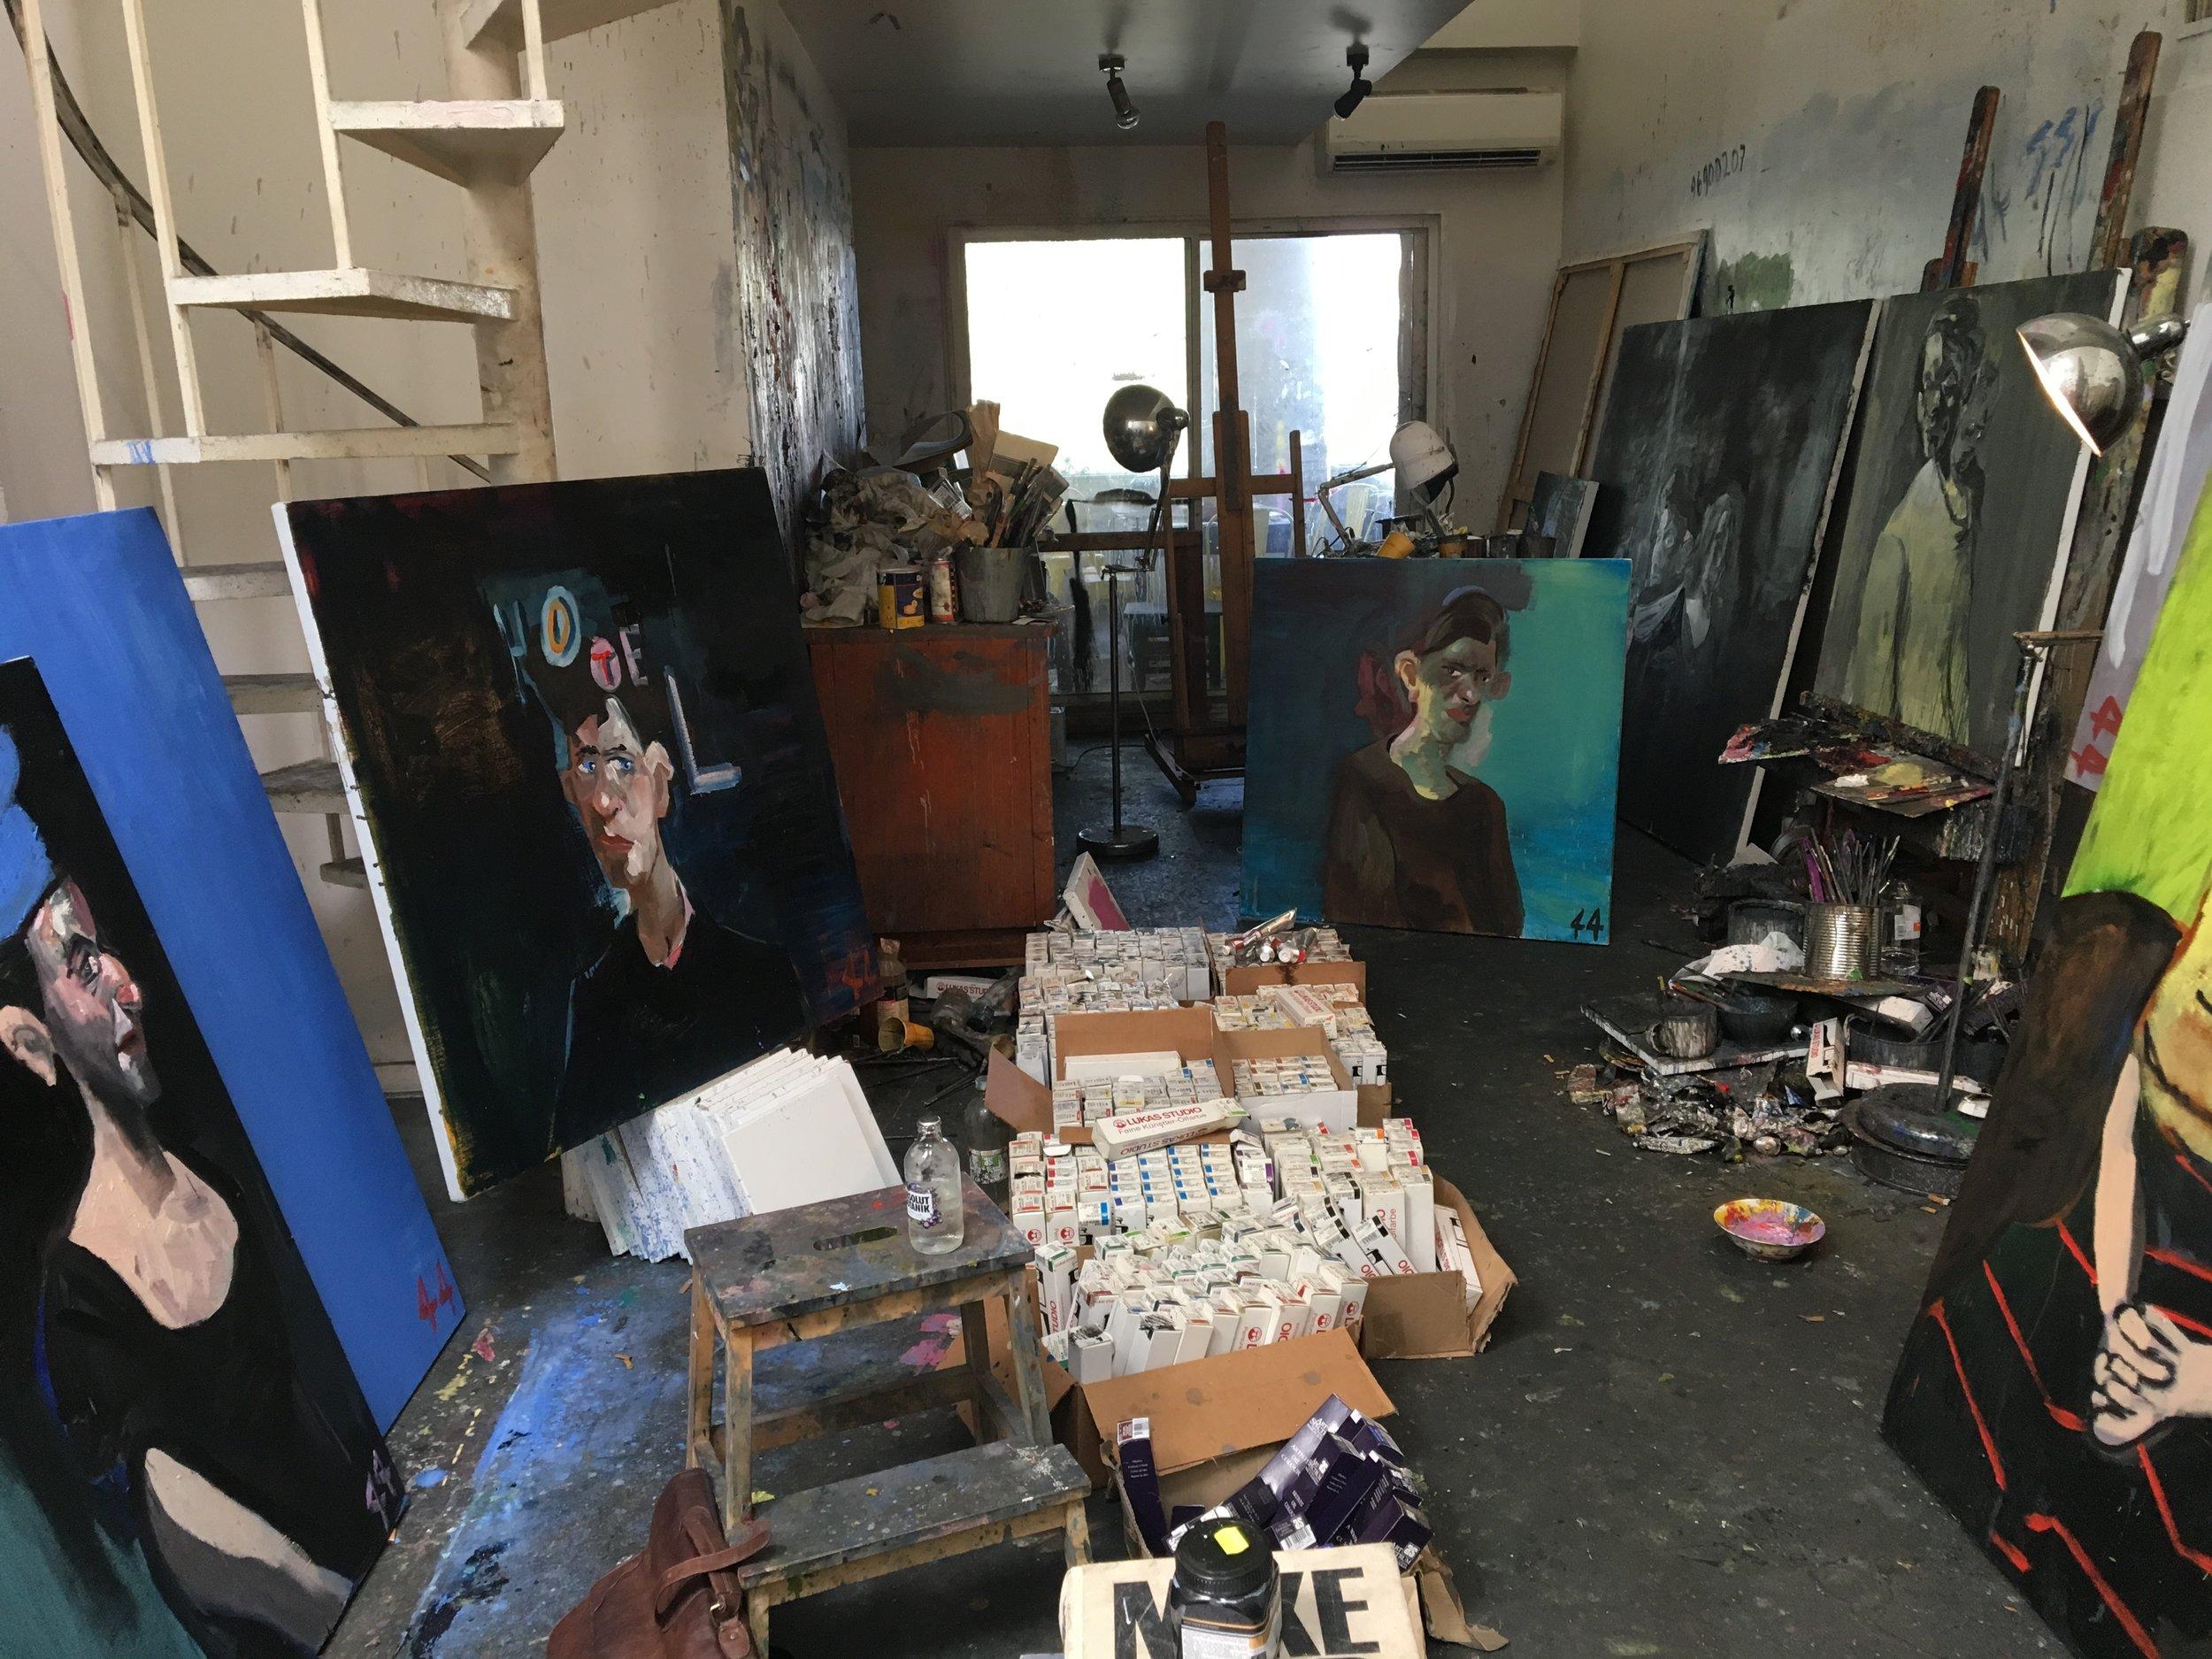 Mclean Edwards' studio in Sydney